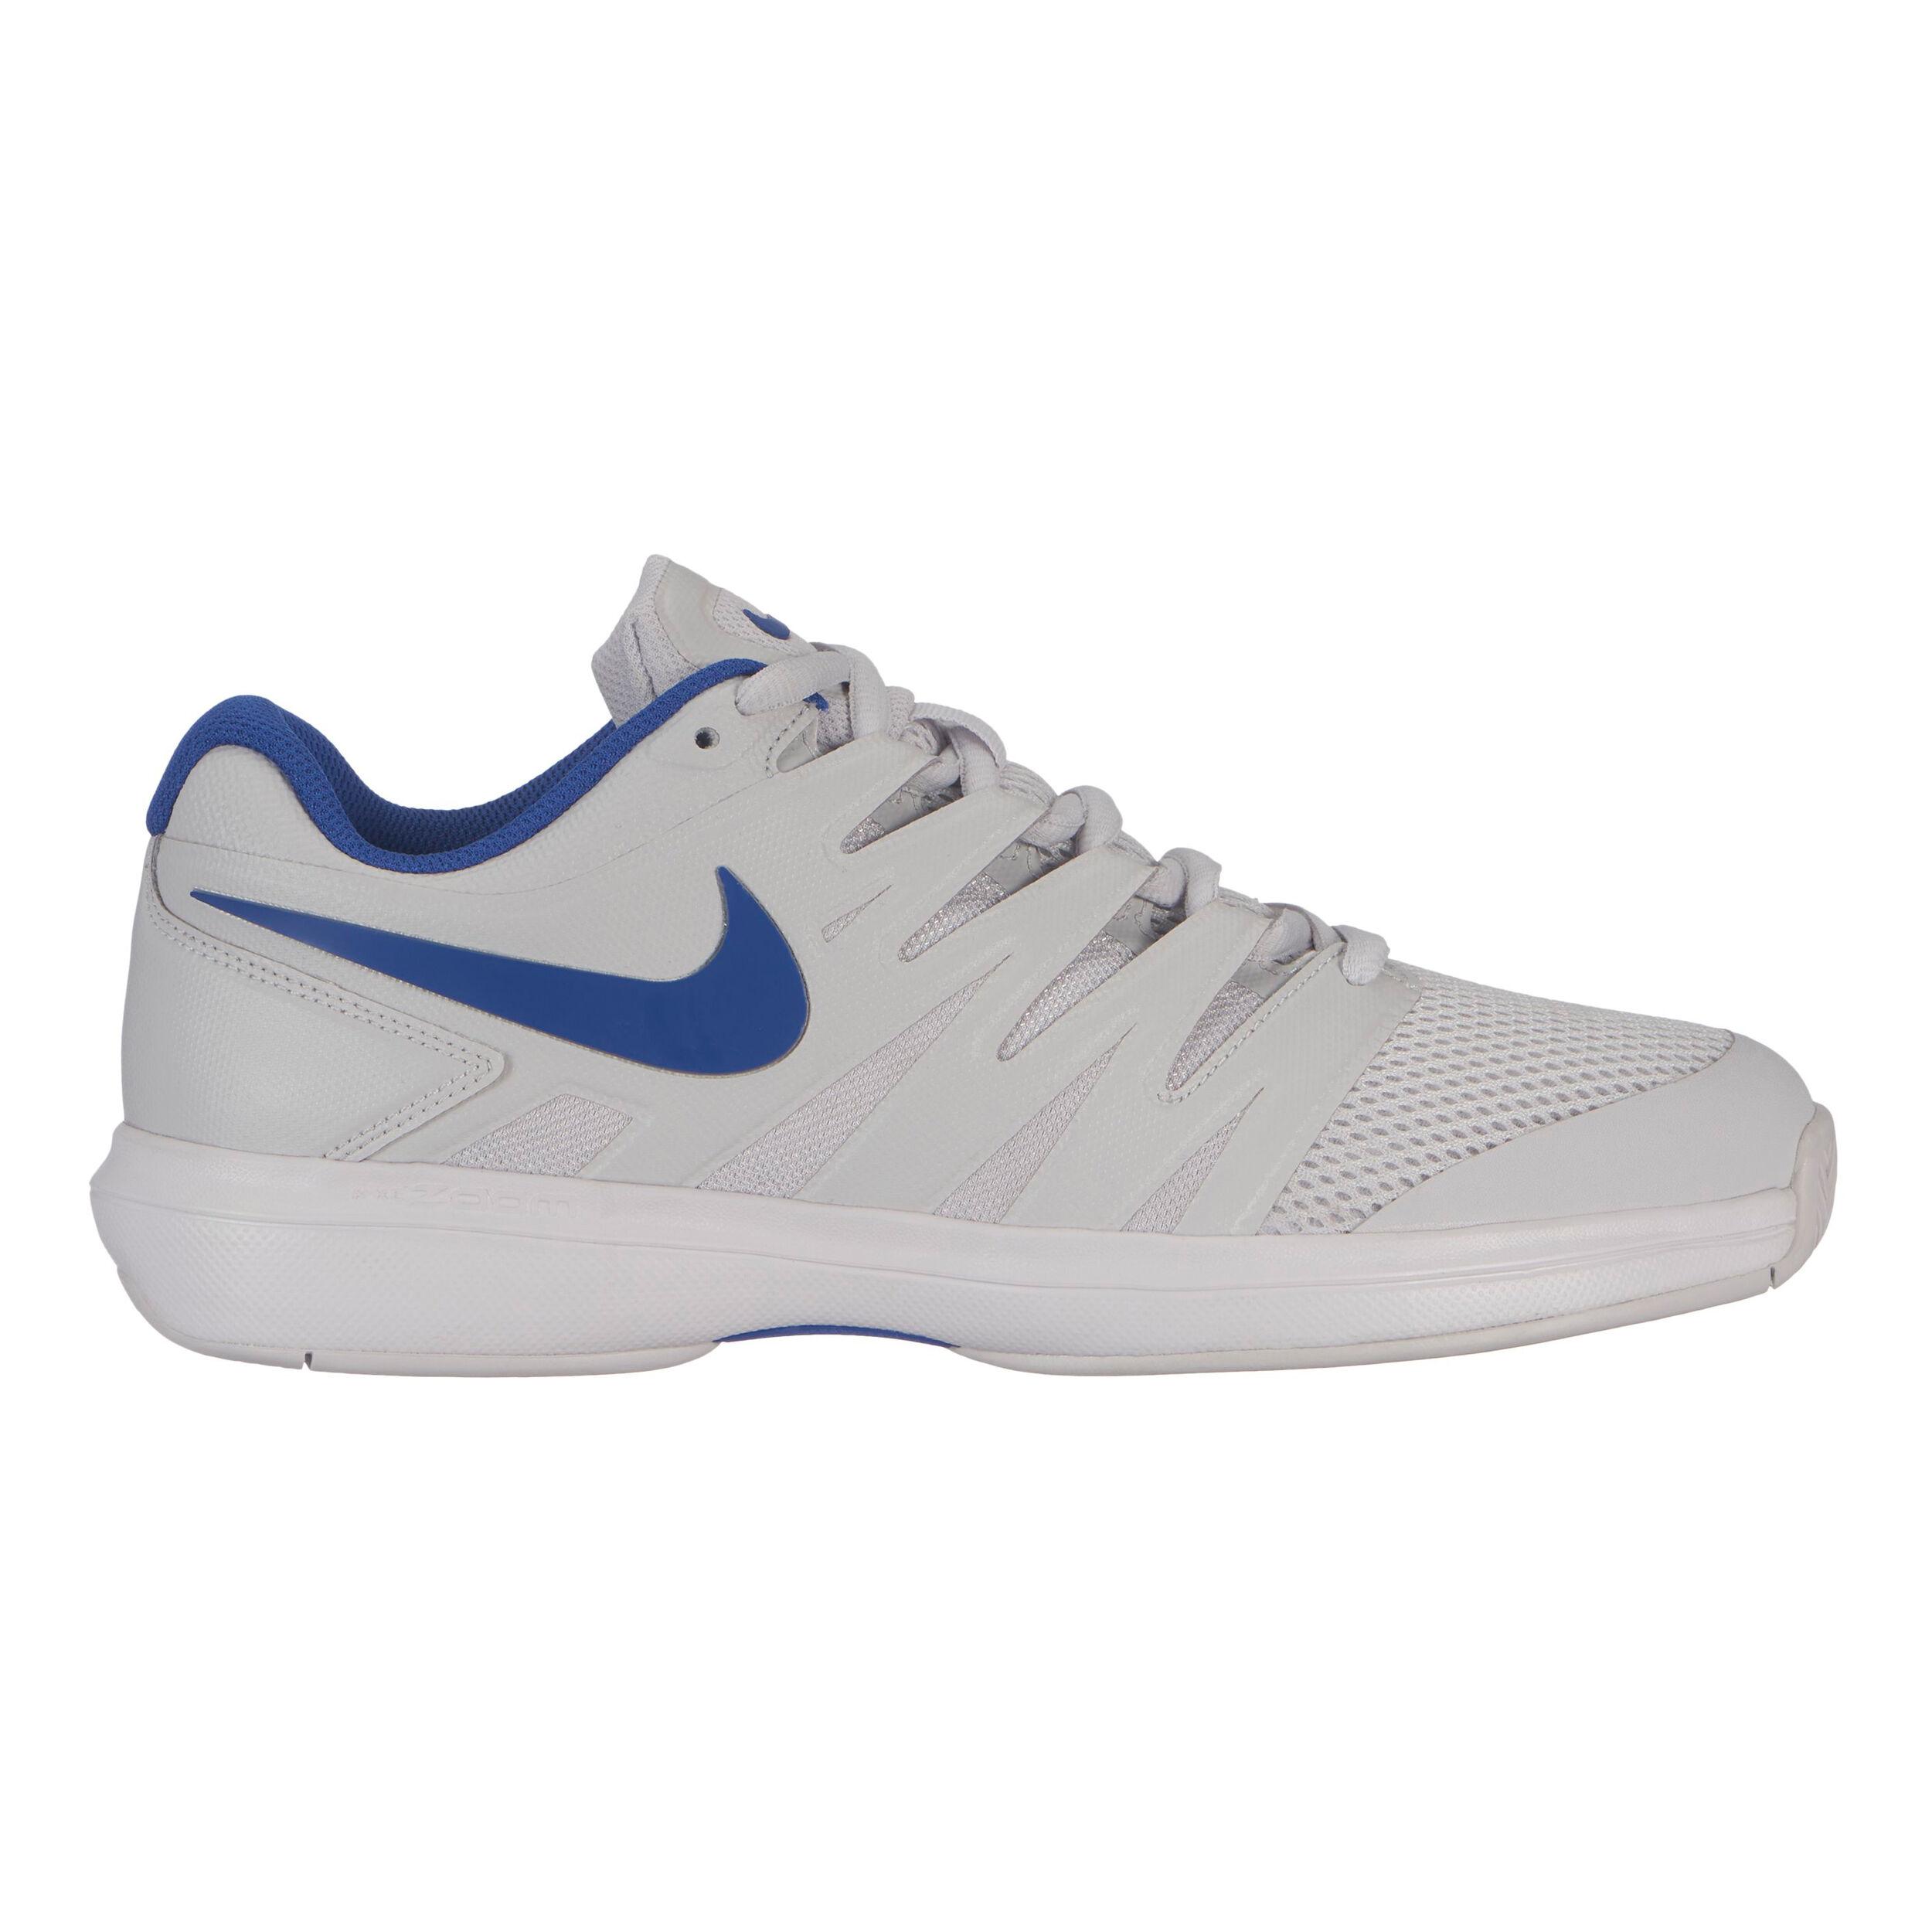 Chaussure Air Prestige Tout Enfants Gris Terrain Nike Zoom ClairBleu iPXOkZu